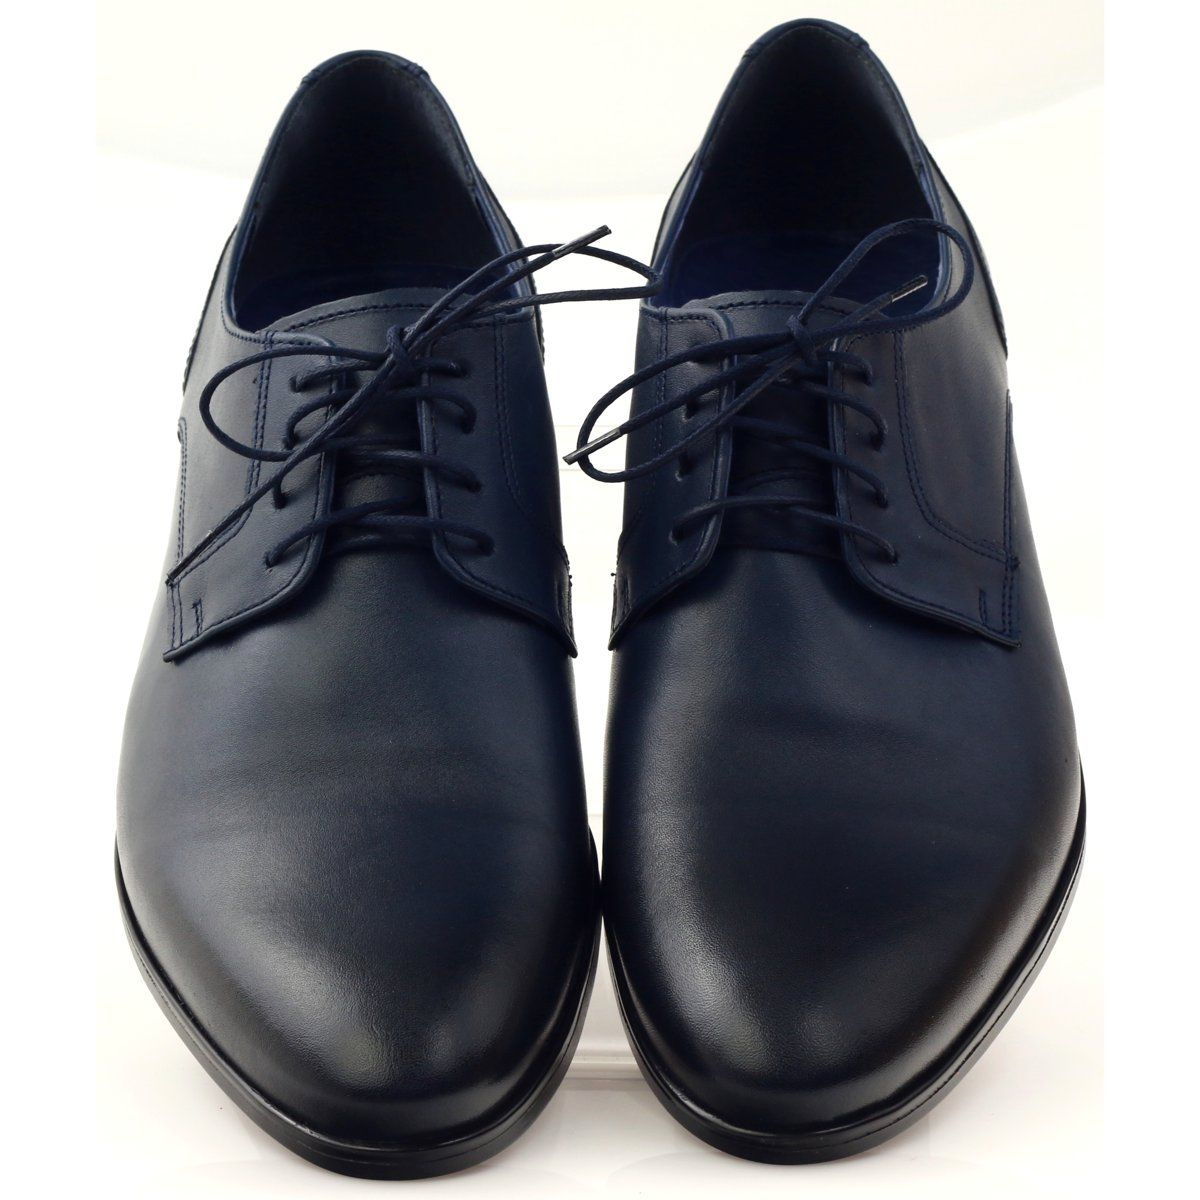 Polbuty Pantofle Meskie Nikopol 1628 Granatowe Shoes Mens Dress Shoes Men Oxford Shoes